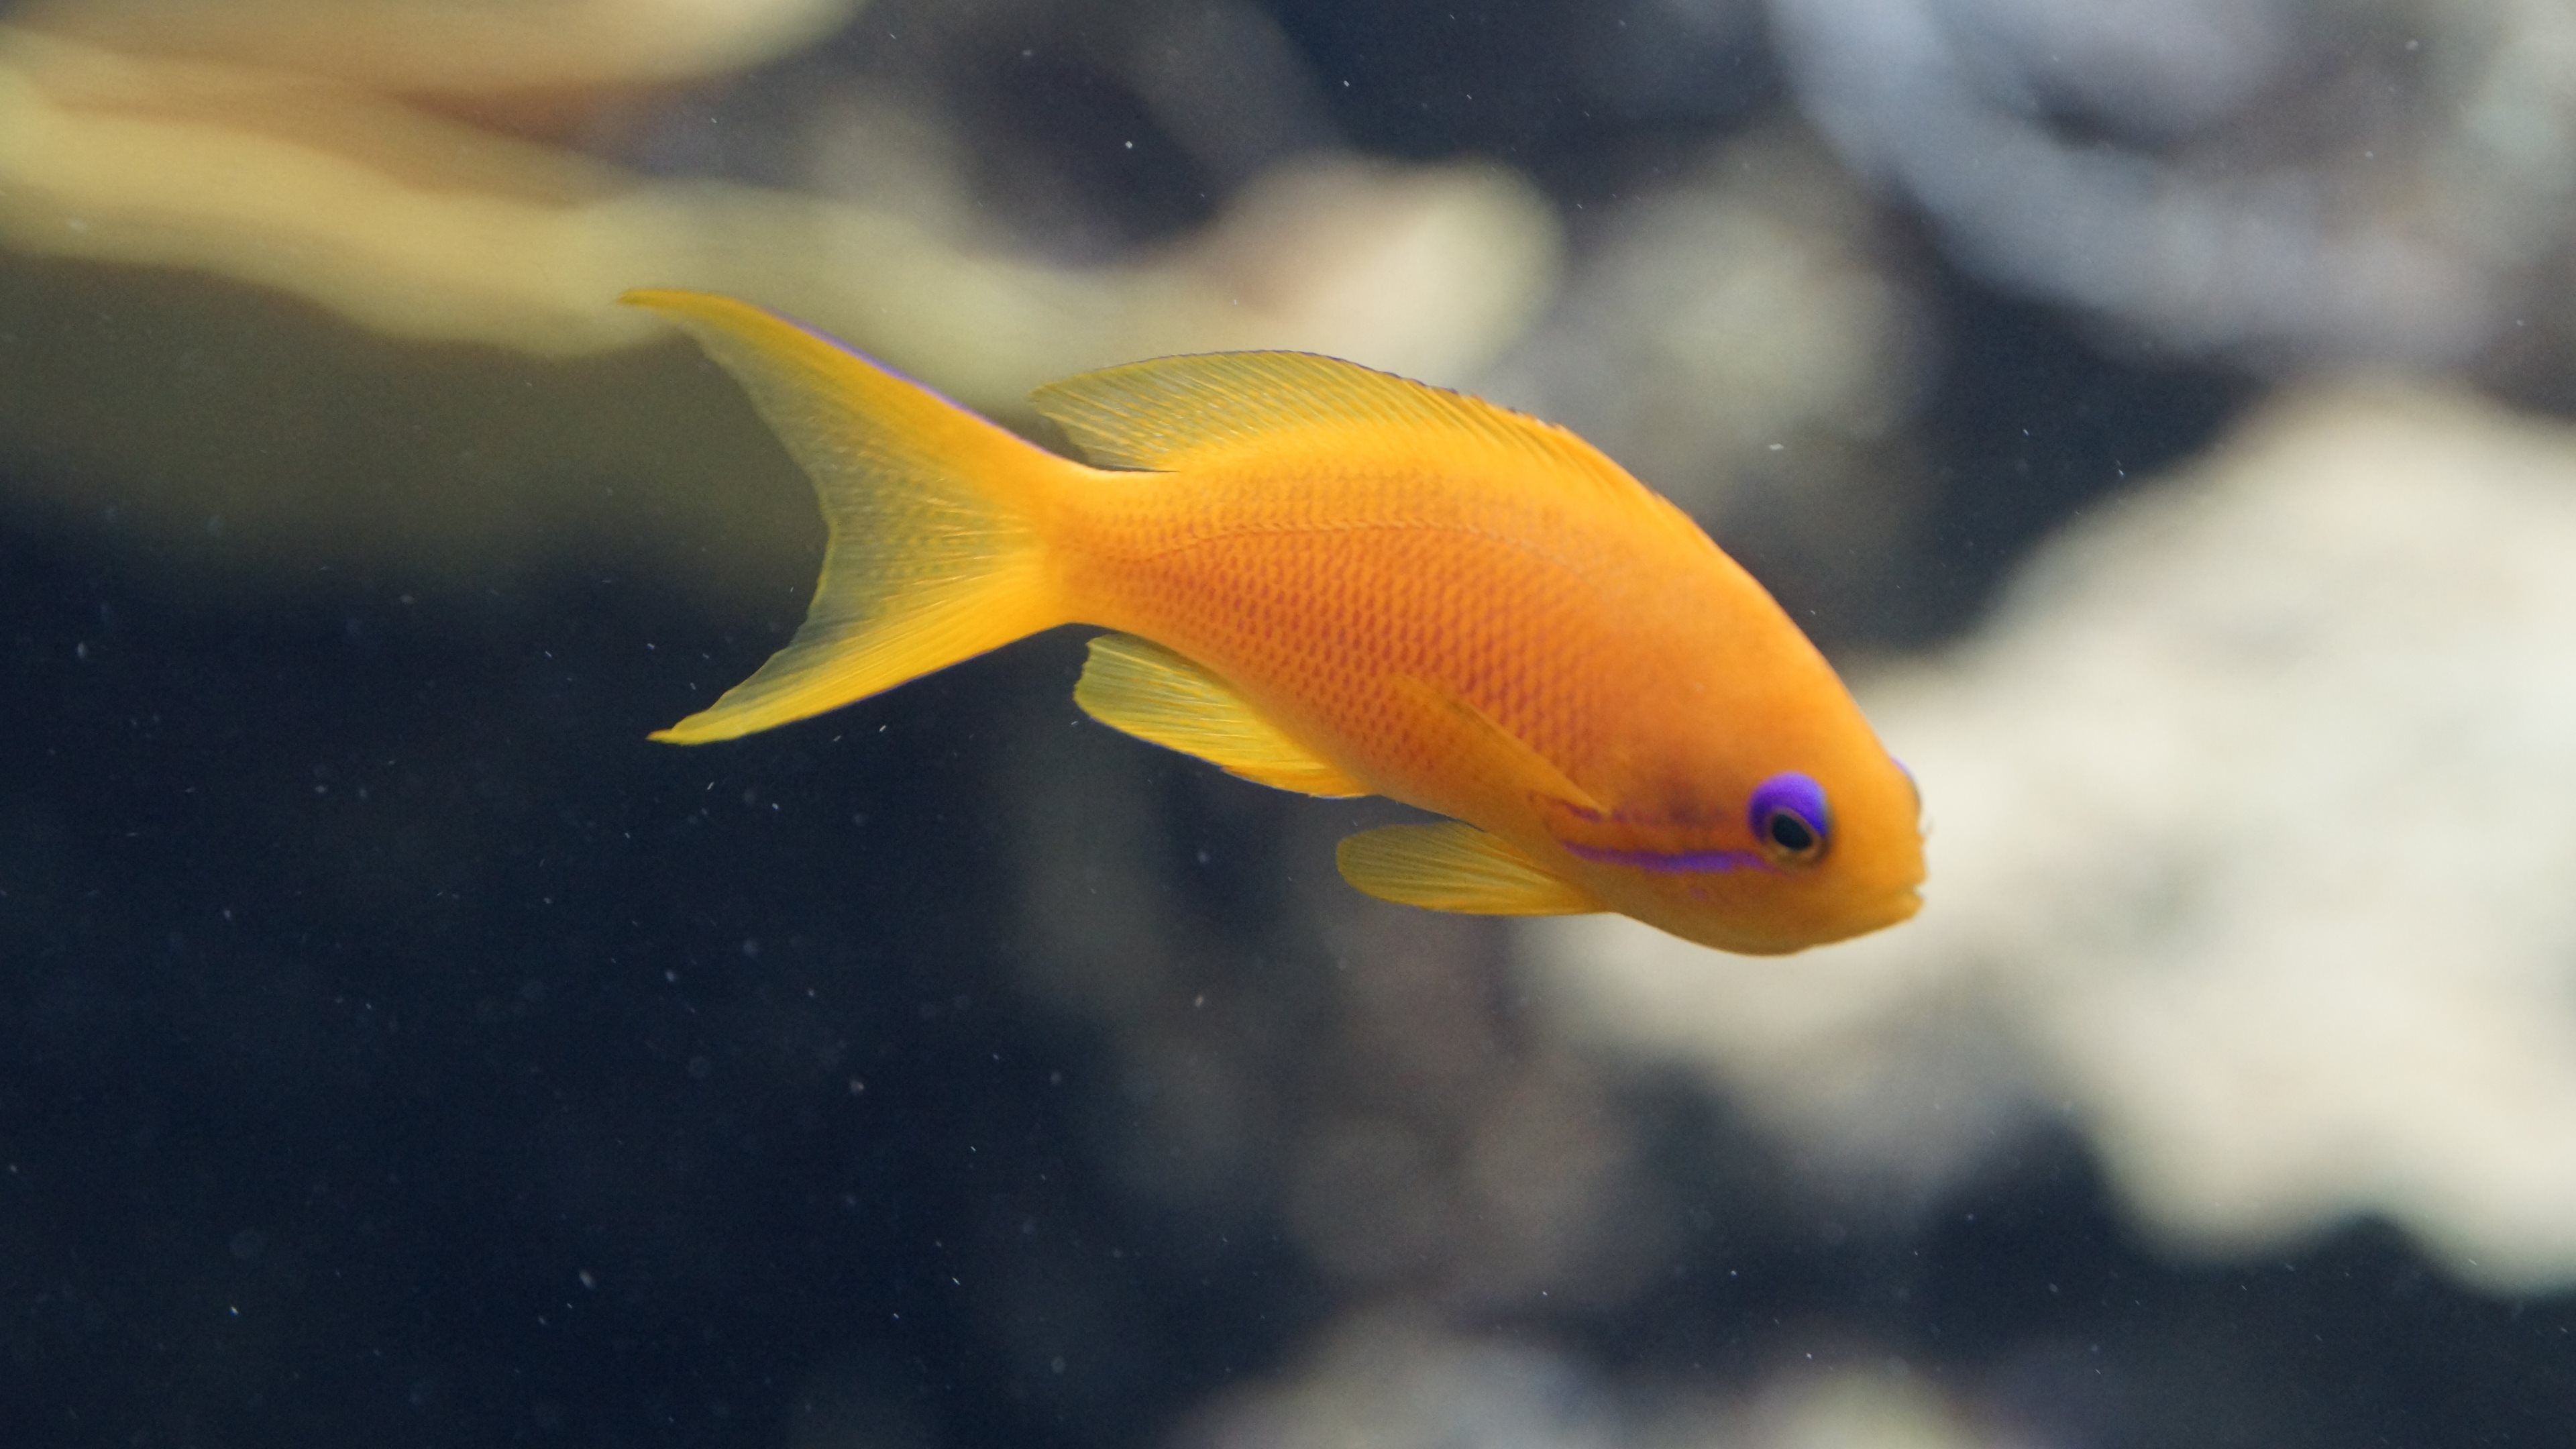 Dark coral aquarium 4K Ultra HD Wallpaper